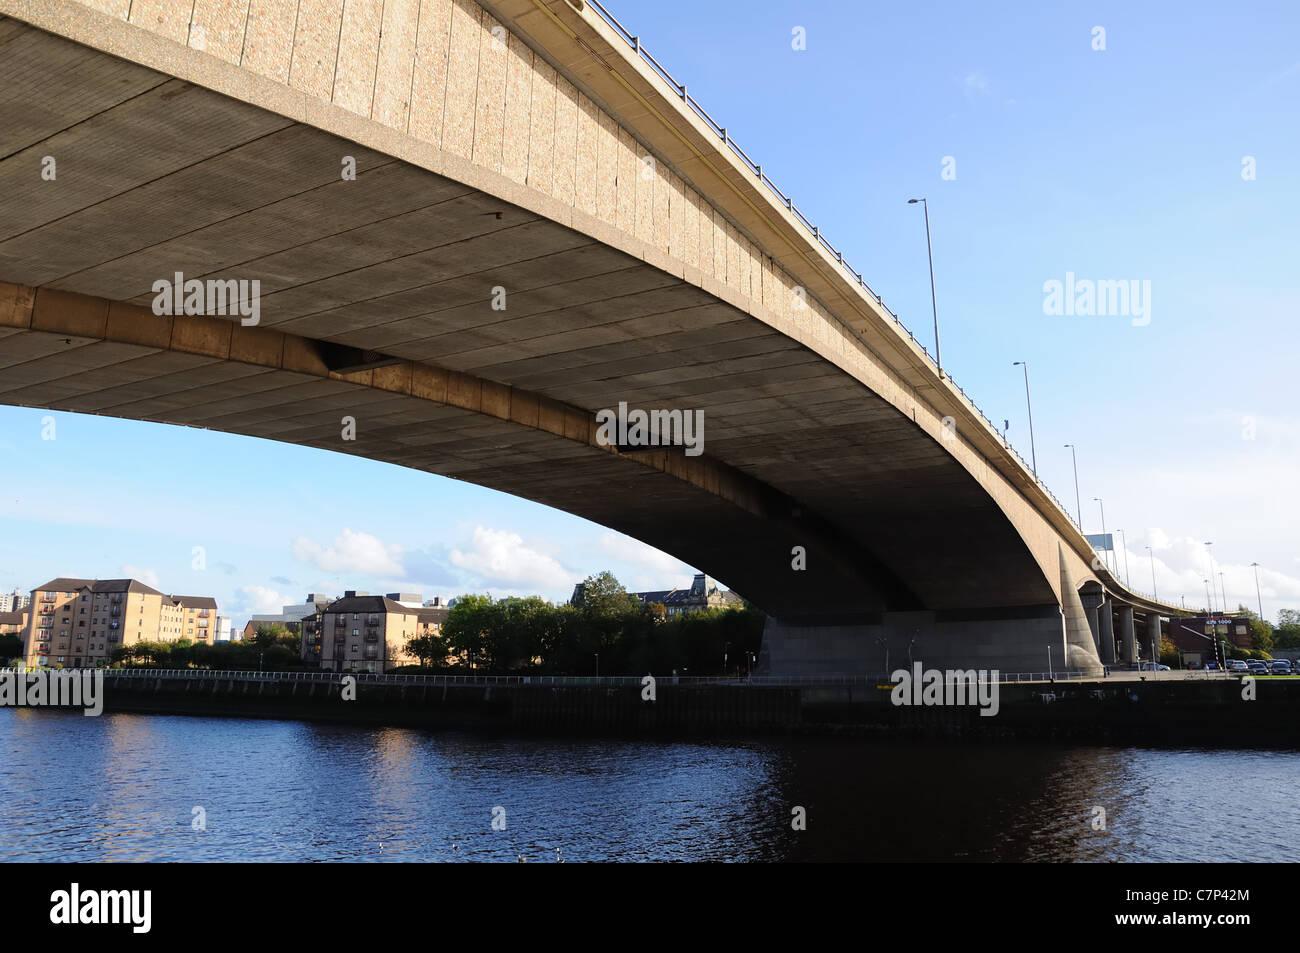 Looking up to the span of the Kingston Bridge, M8 motorway, Glasgow, UK, Europe - Stock Image